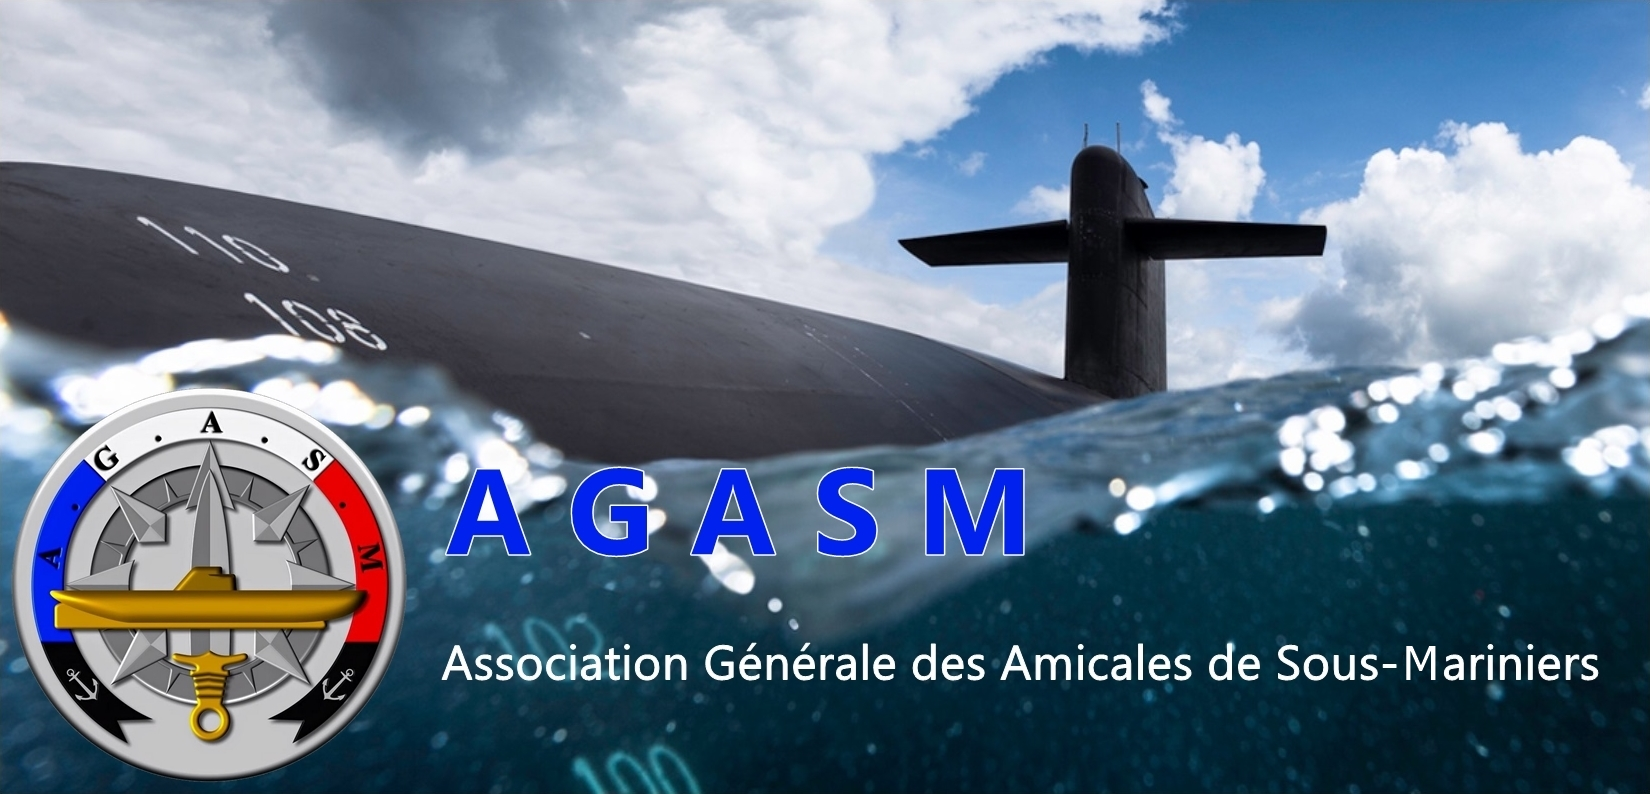 AGASM-Sous-marins